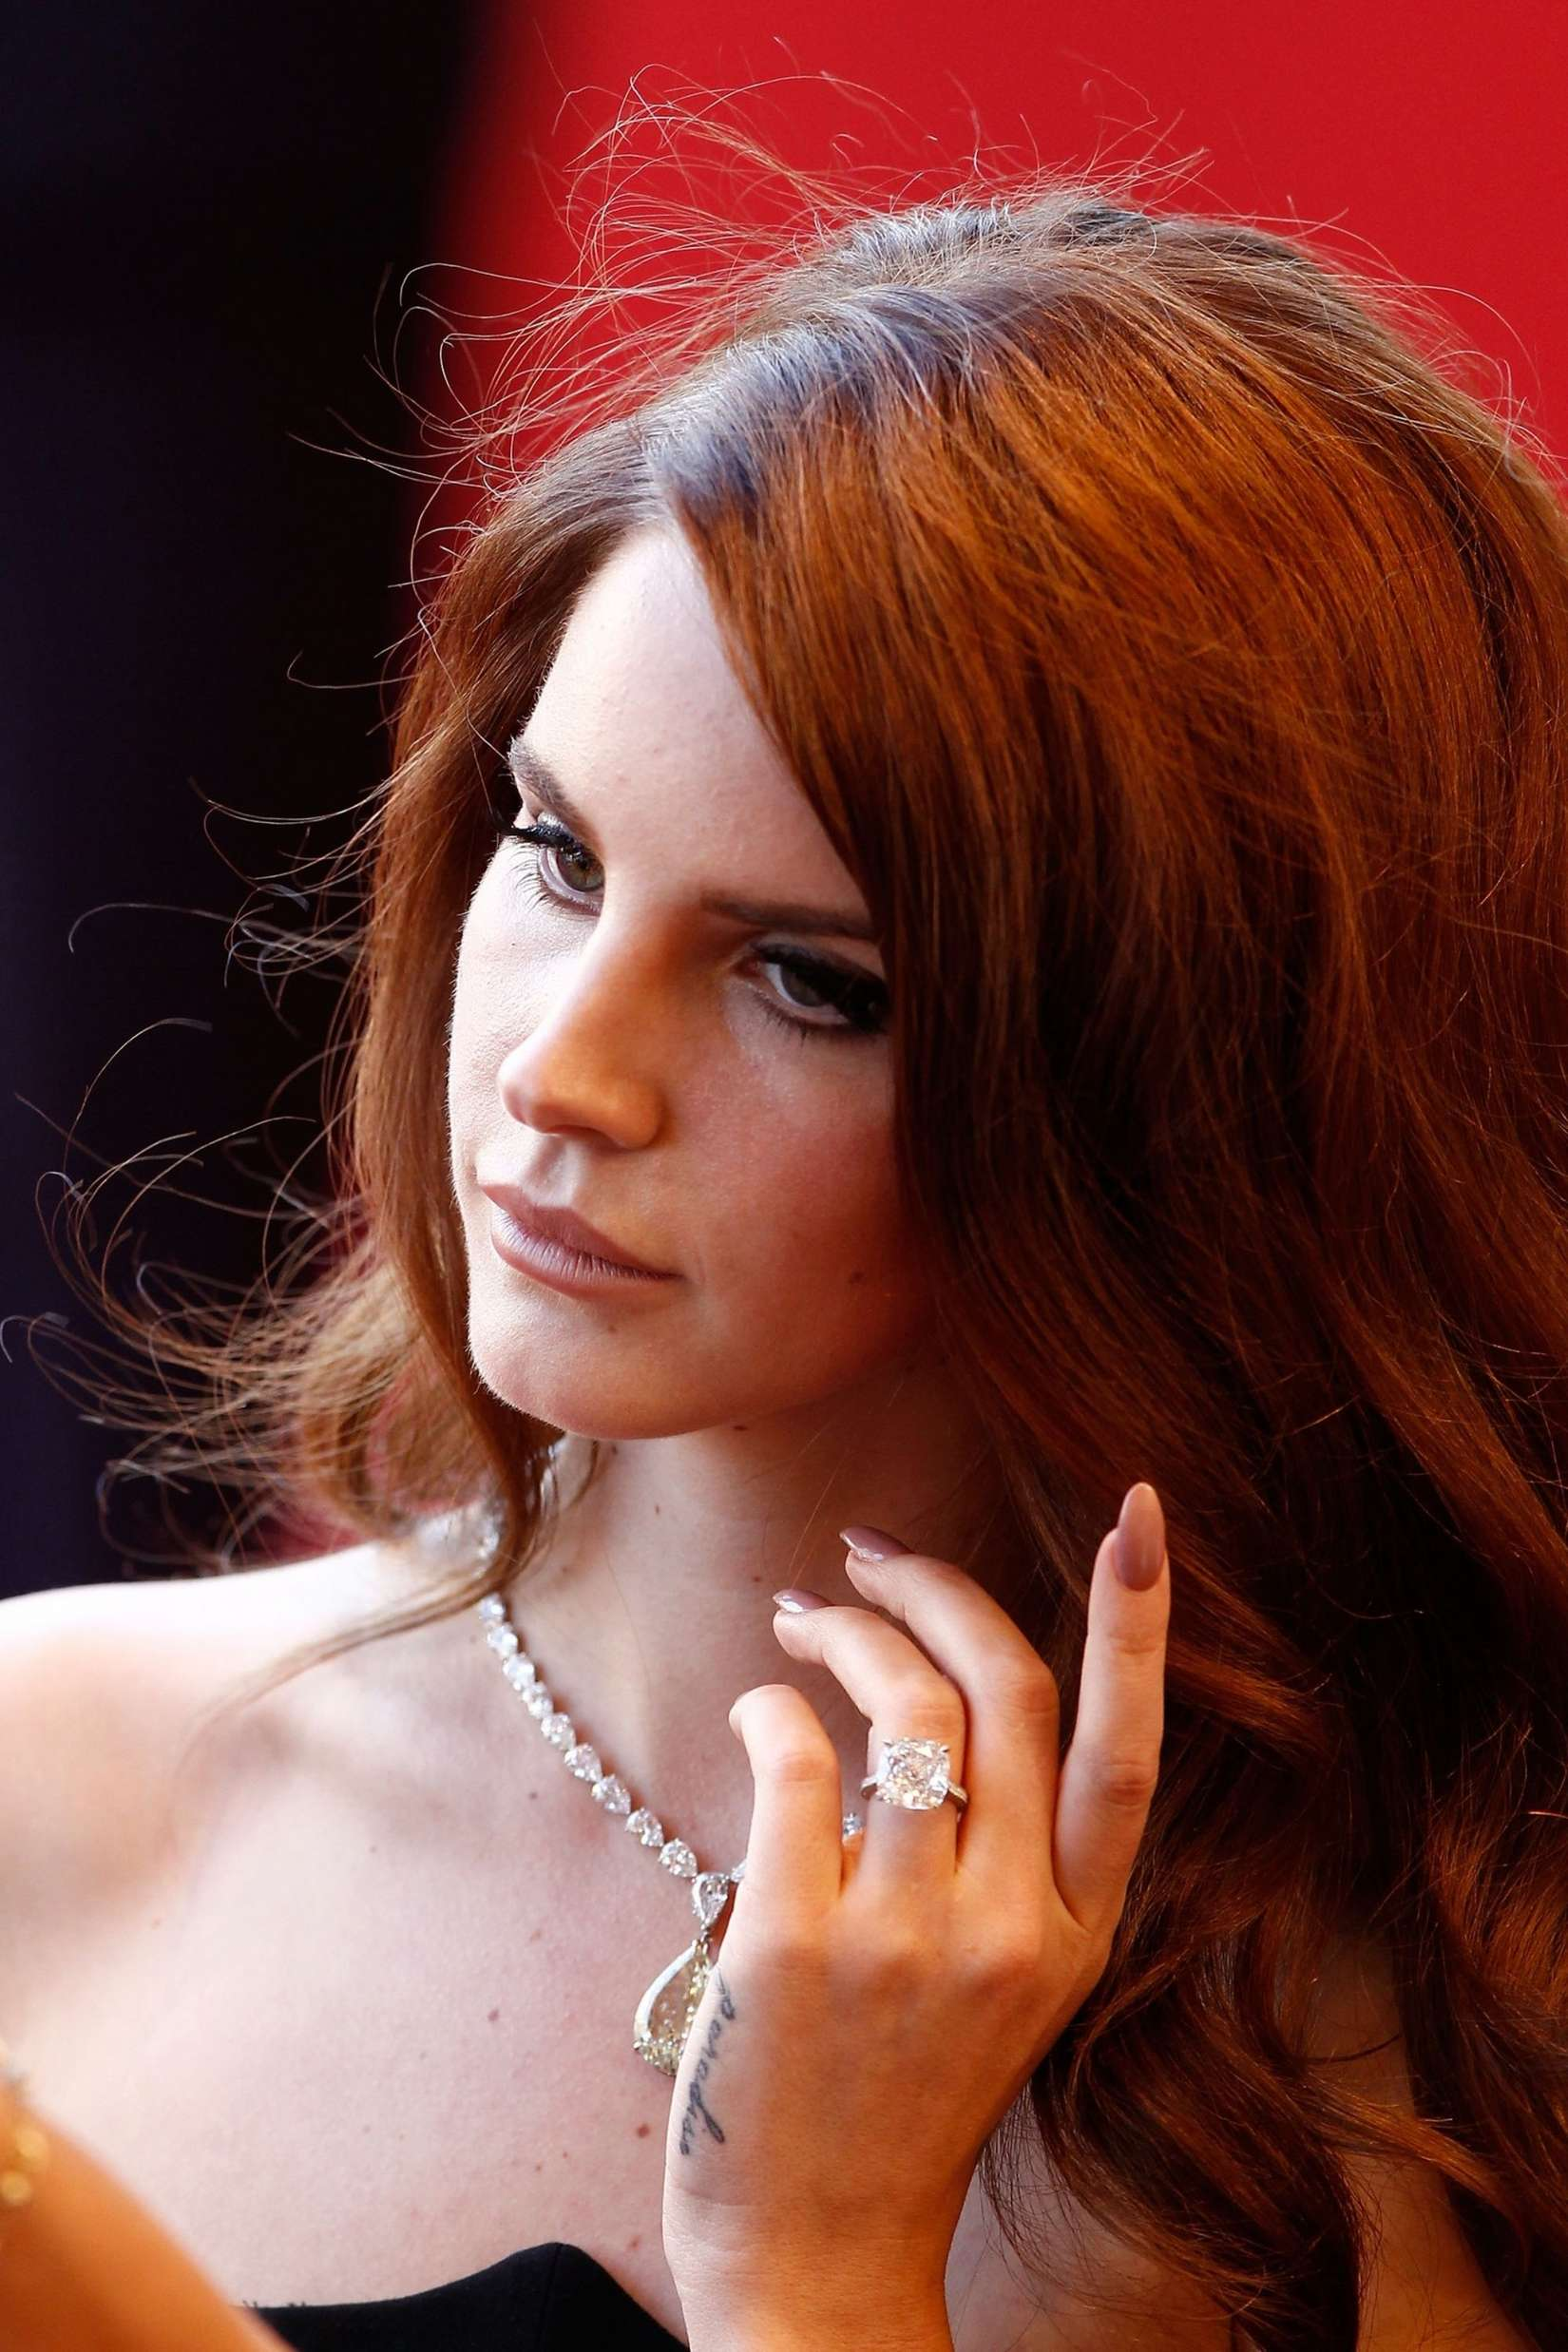 Lana Del Rey 2012 Cannes Film Festival Opening Ceremony